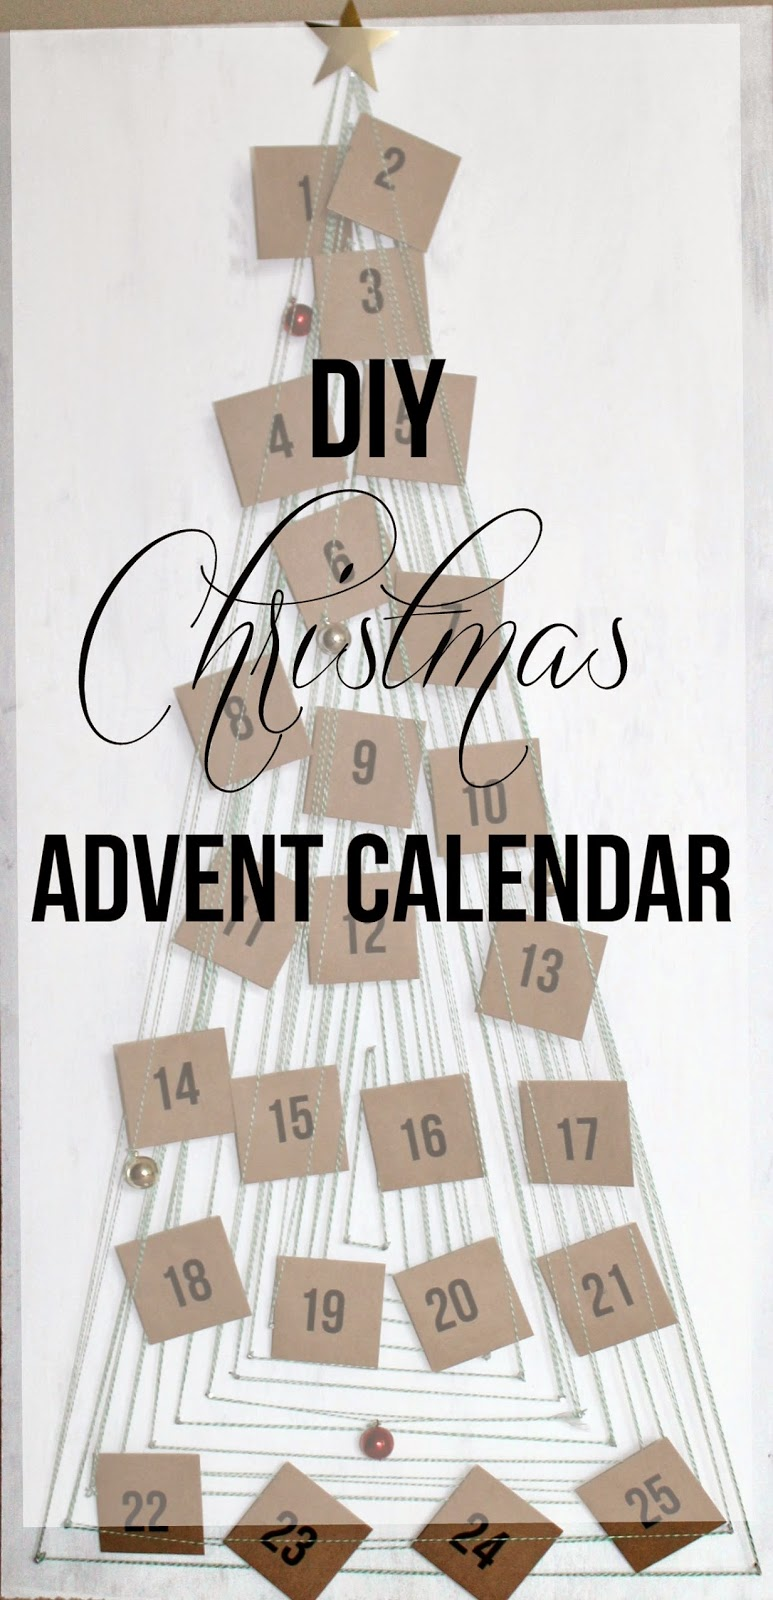 DIY Christmas Advent Calendar | Bubbles and Gold